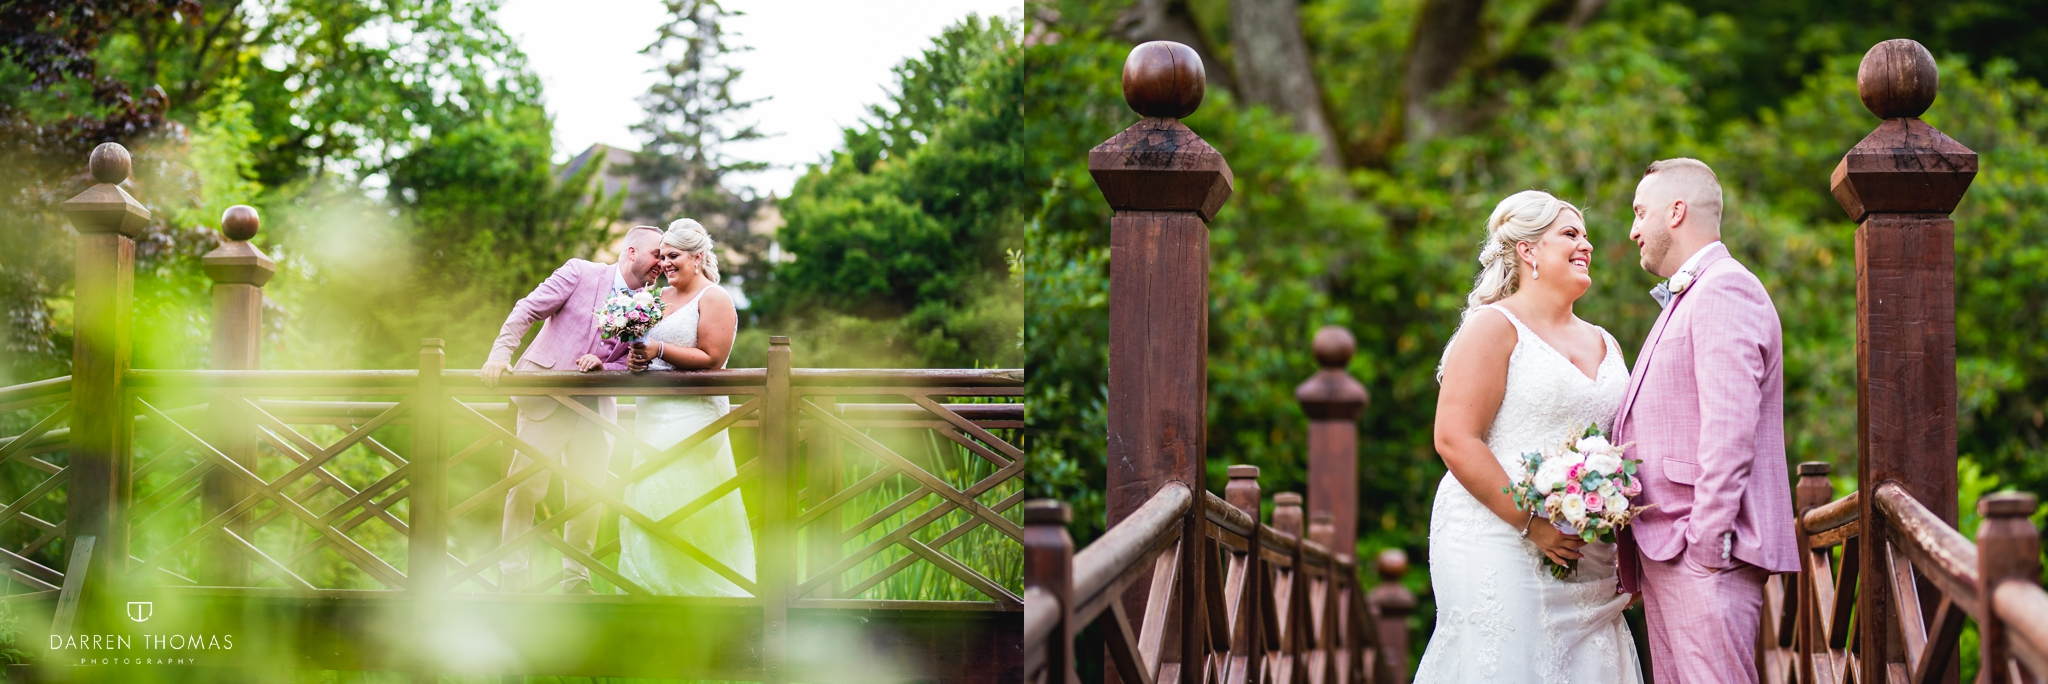 Bryngarw House Wedding Photography17.jpg